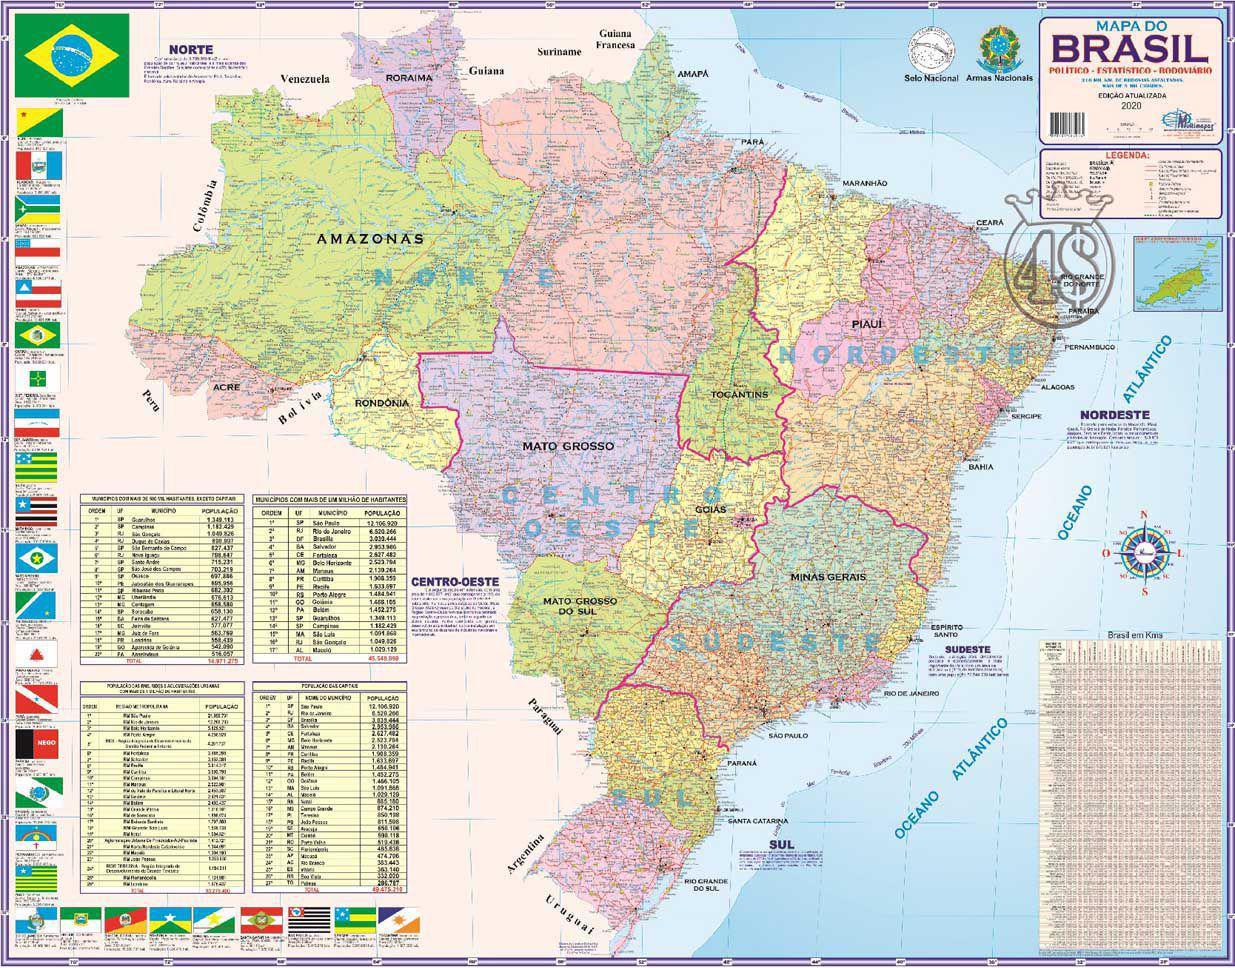 Mapa Brasil Politico Regional Rodoviario 120 X 90cm Gigante